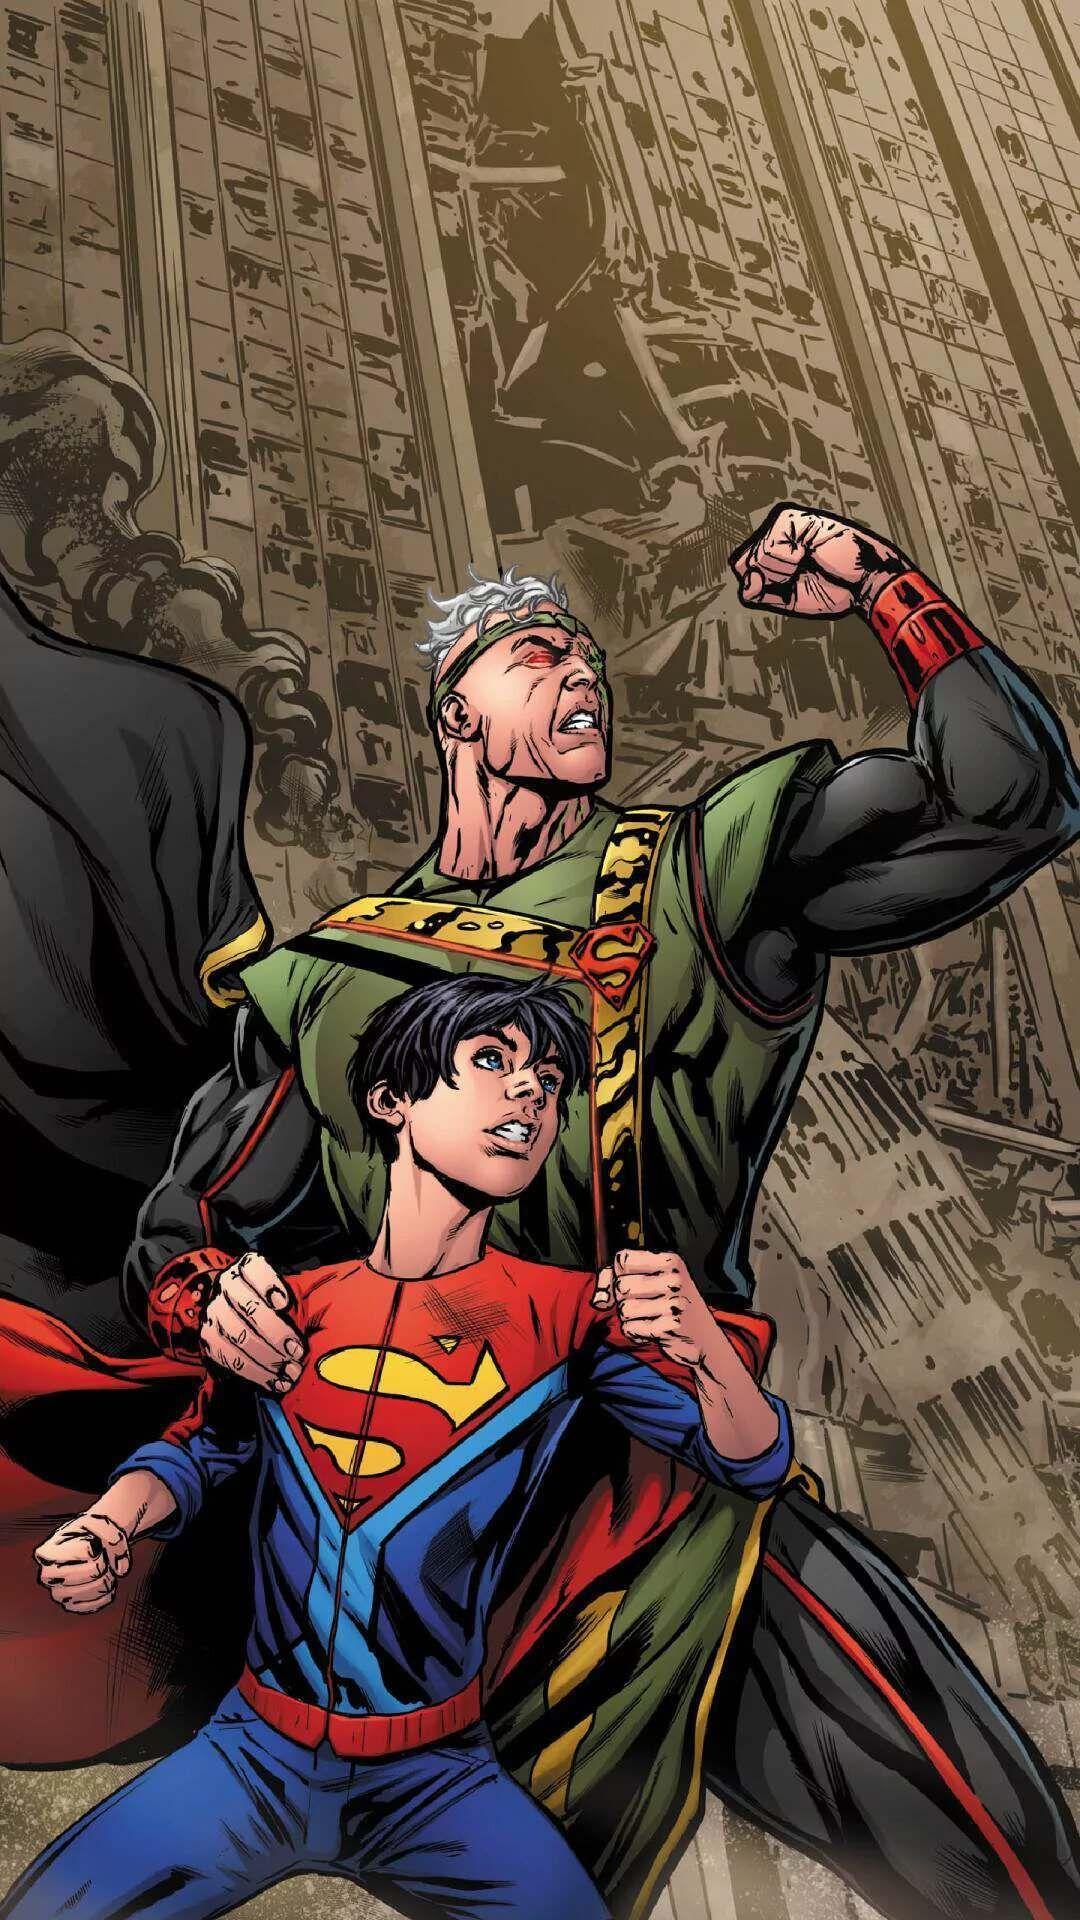 Superman Background Hd in 2020 Superhero comic